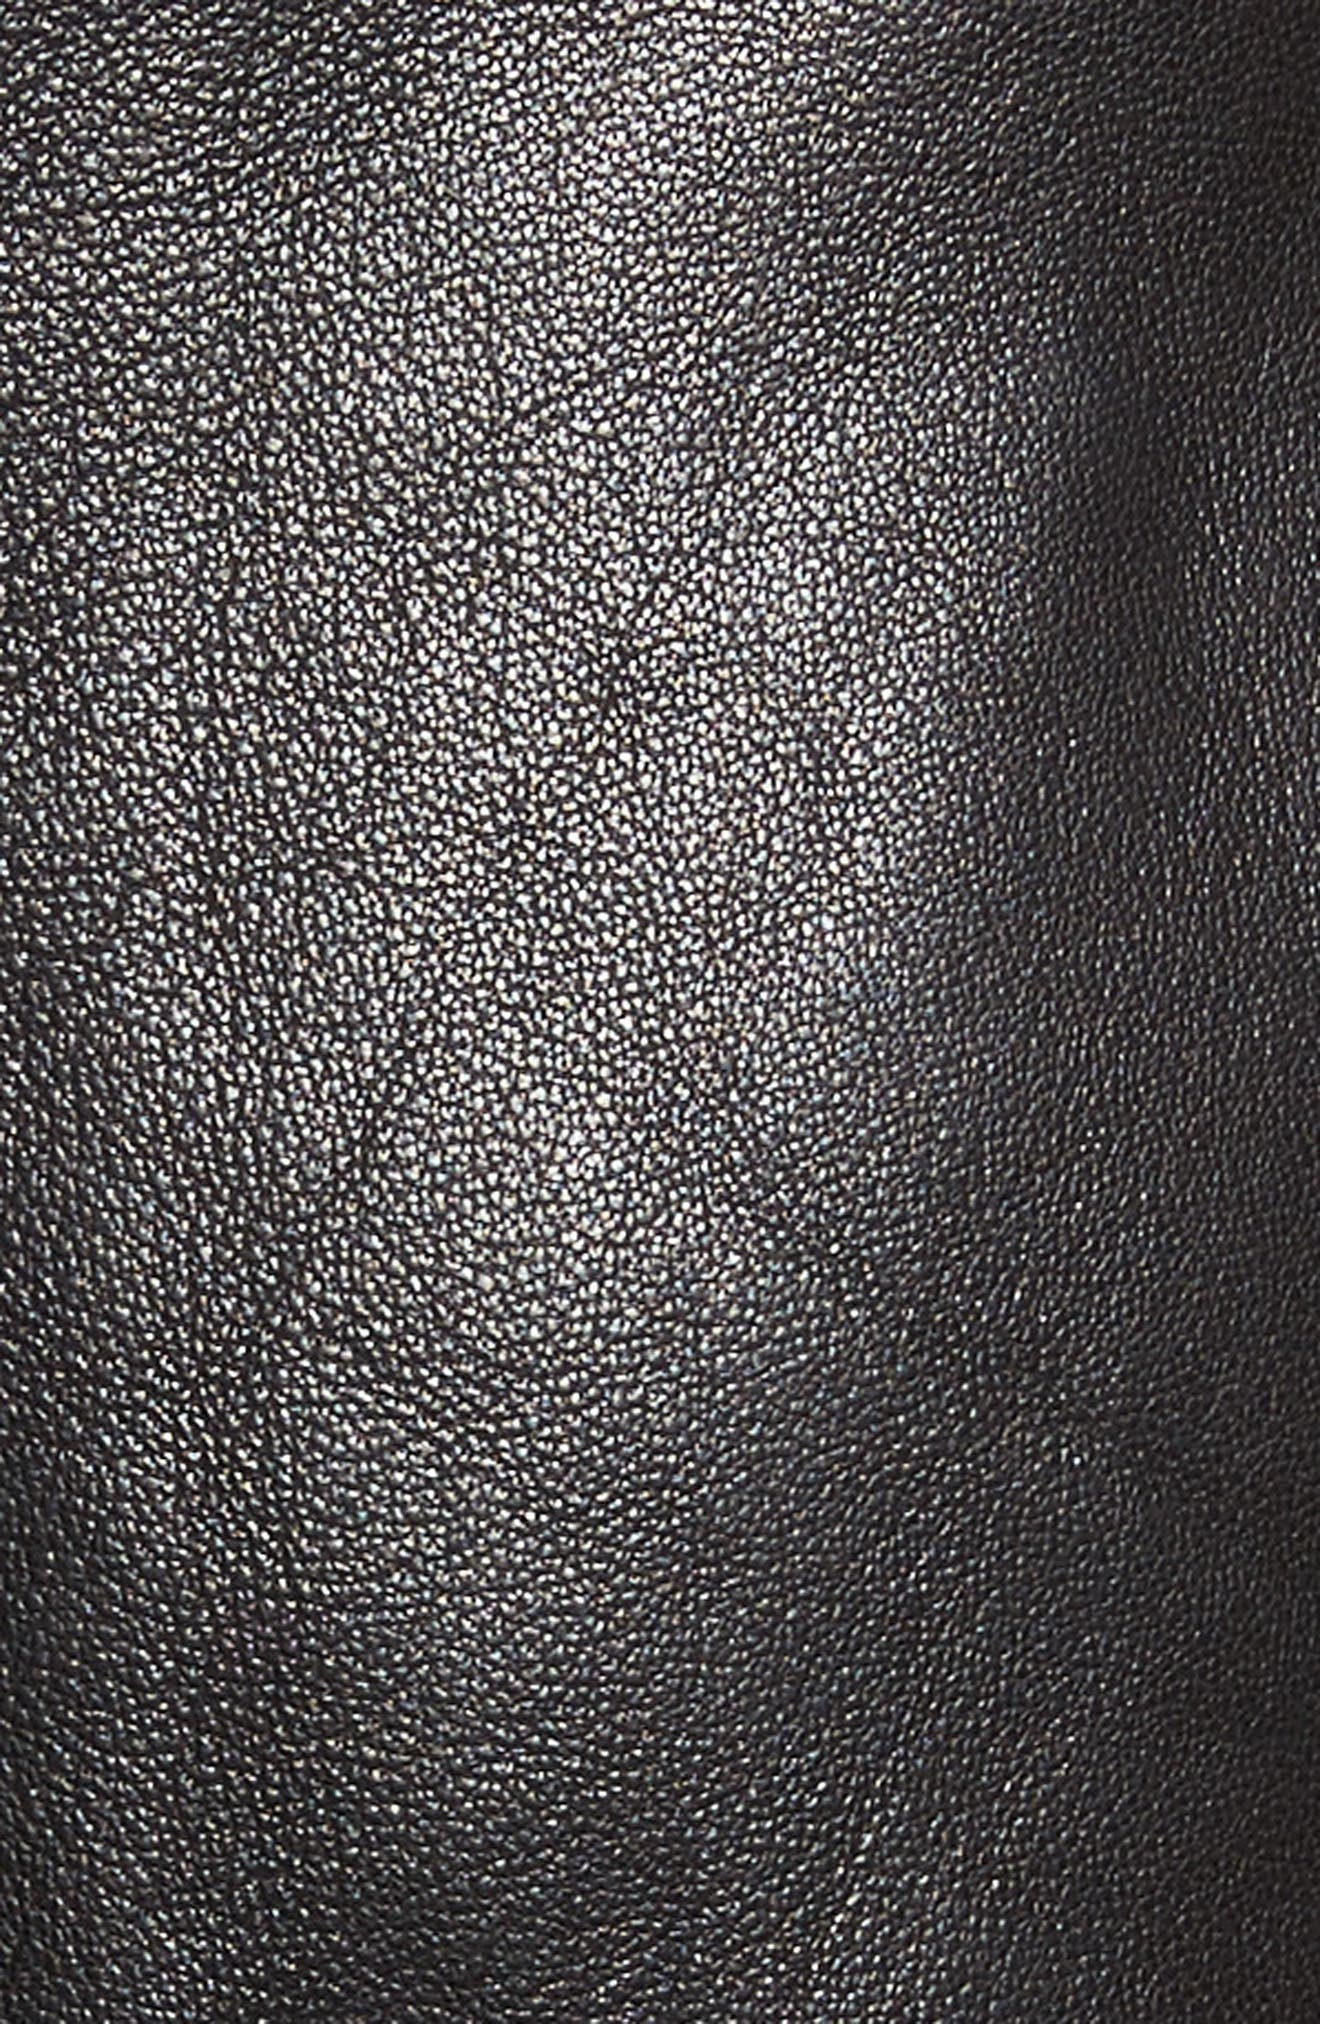 Kahlo Ruffle One-Shoulder Leather Dress,                             Alternate thumbnail 5, color,                             Black